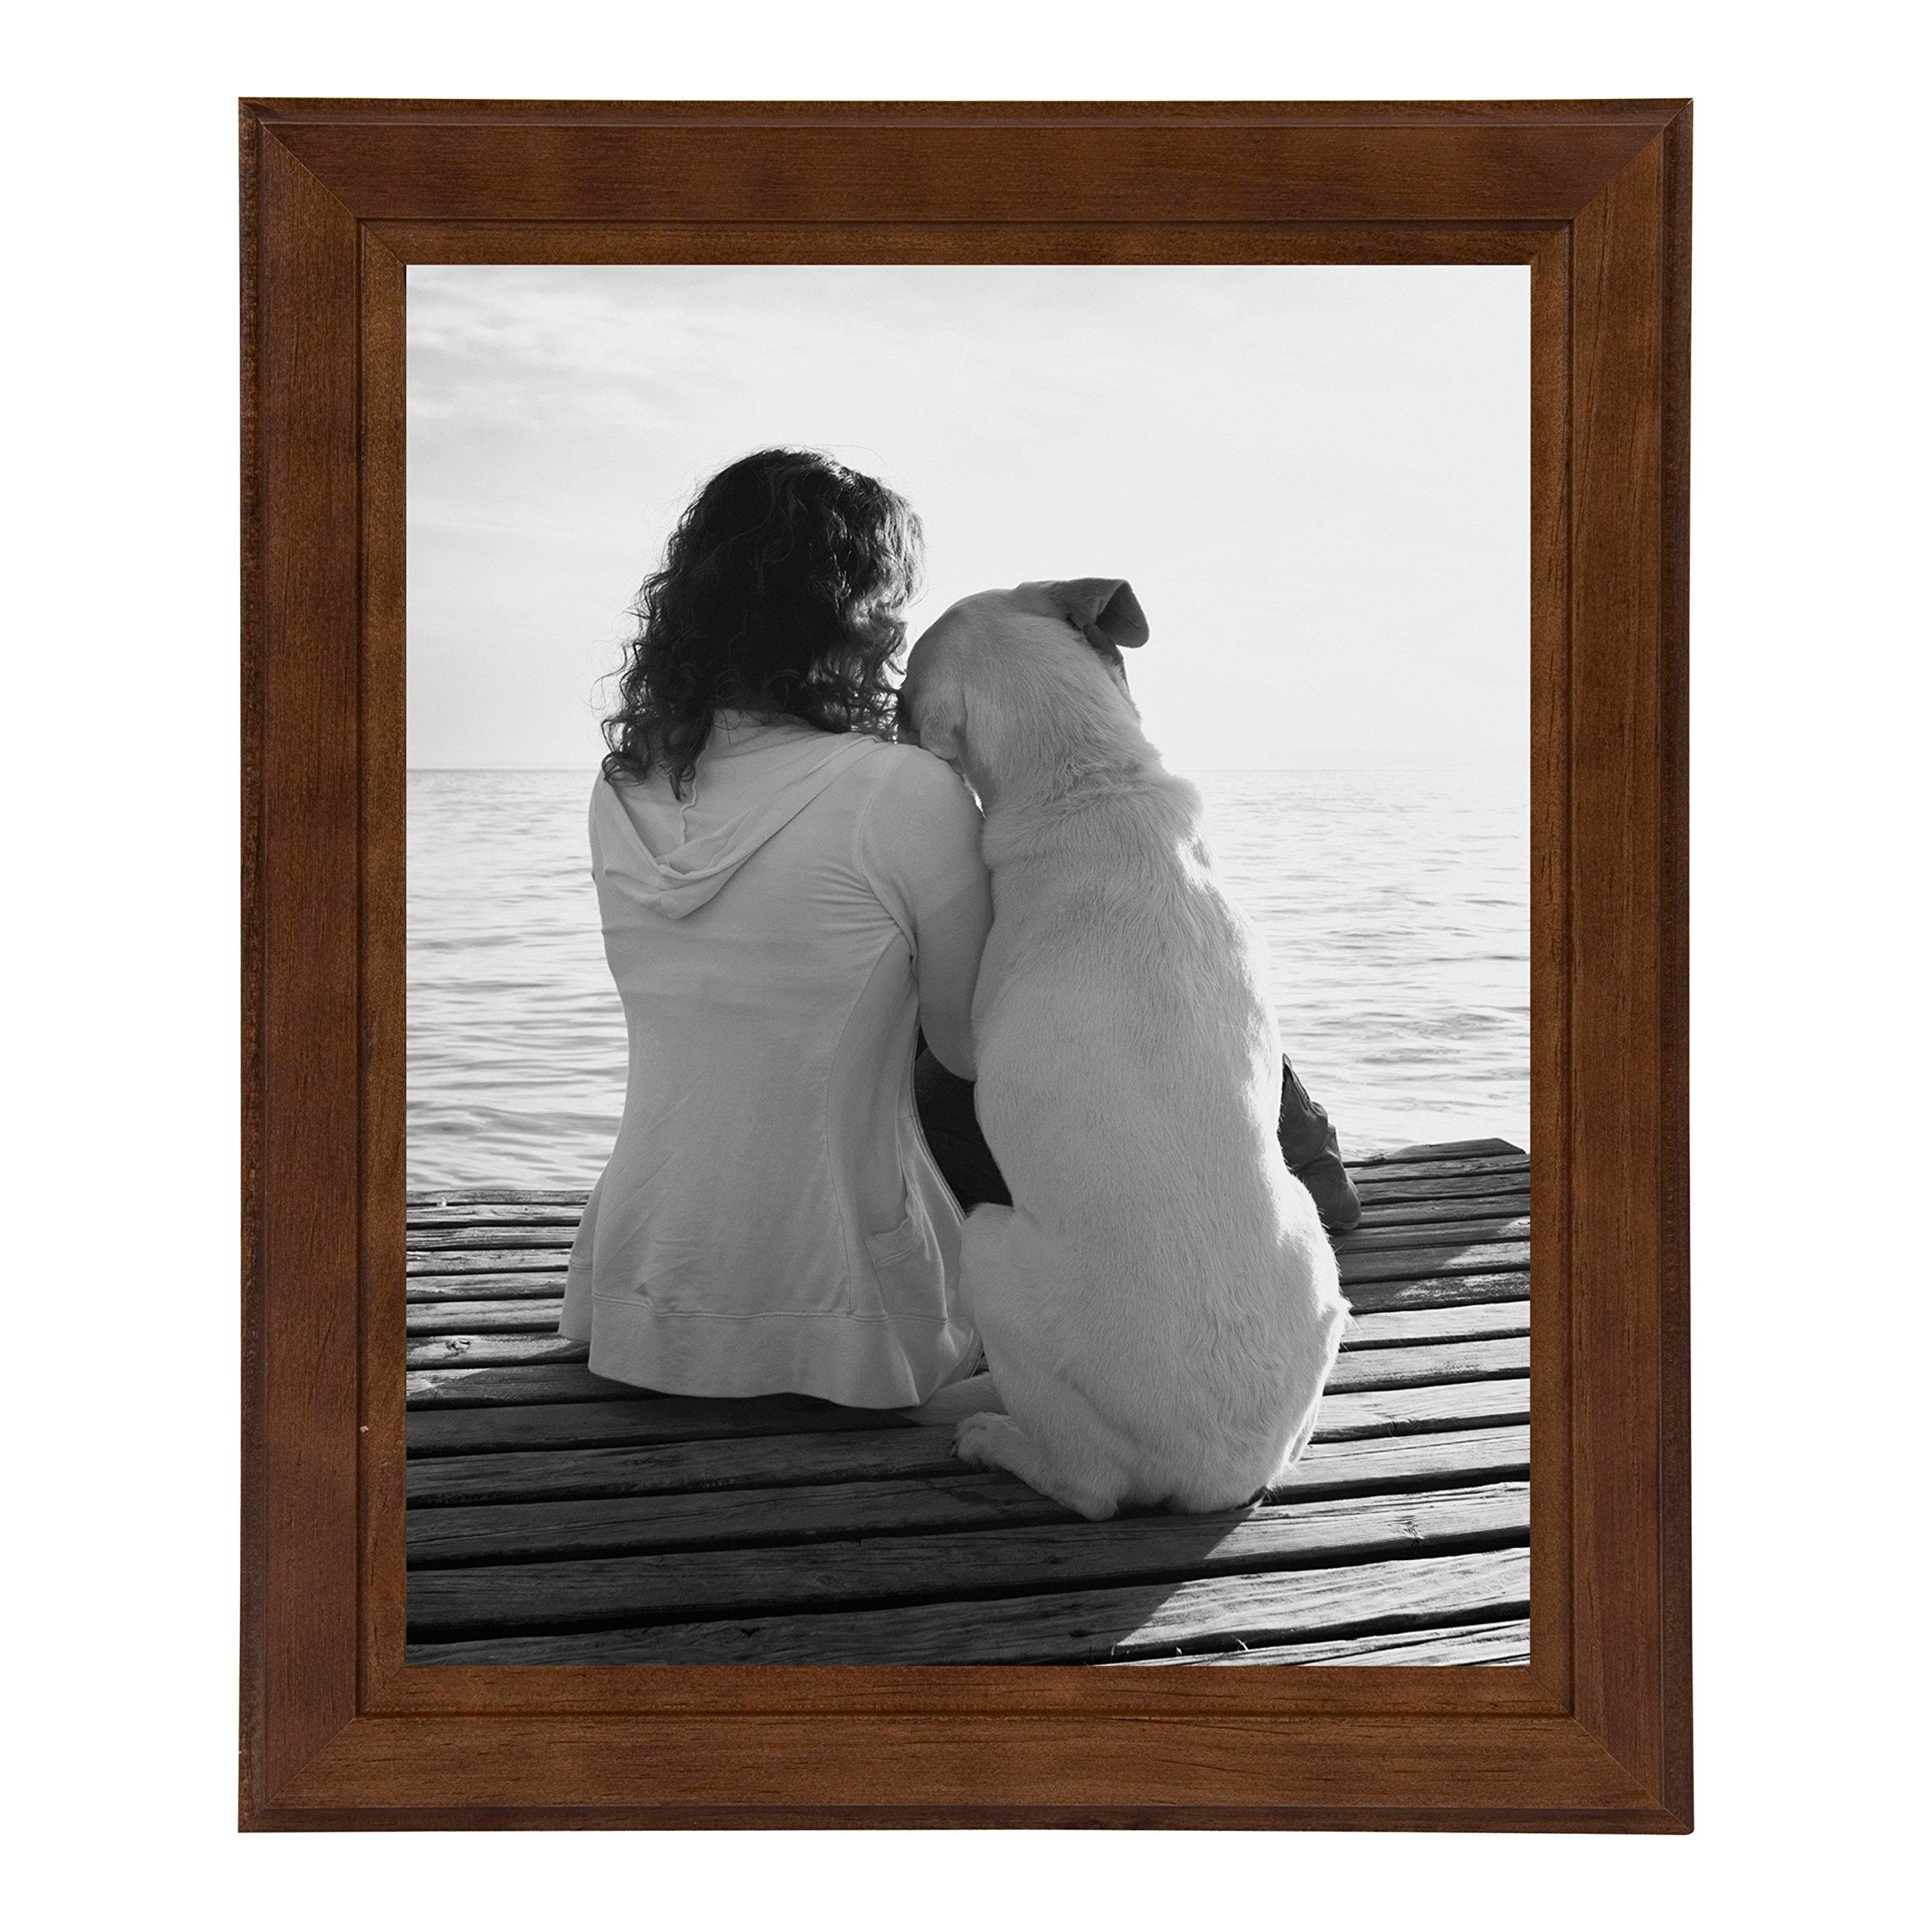 DesignOvation Kieva Solid Wood Picture Frames, Espresso Brown 8x10, Pack of 6 by DesignOvation (Image #2)